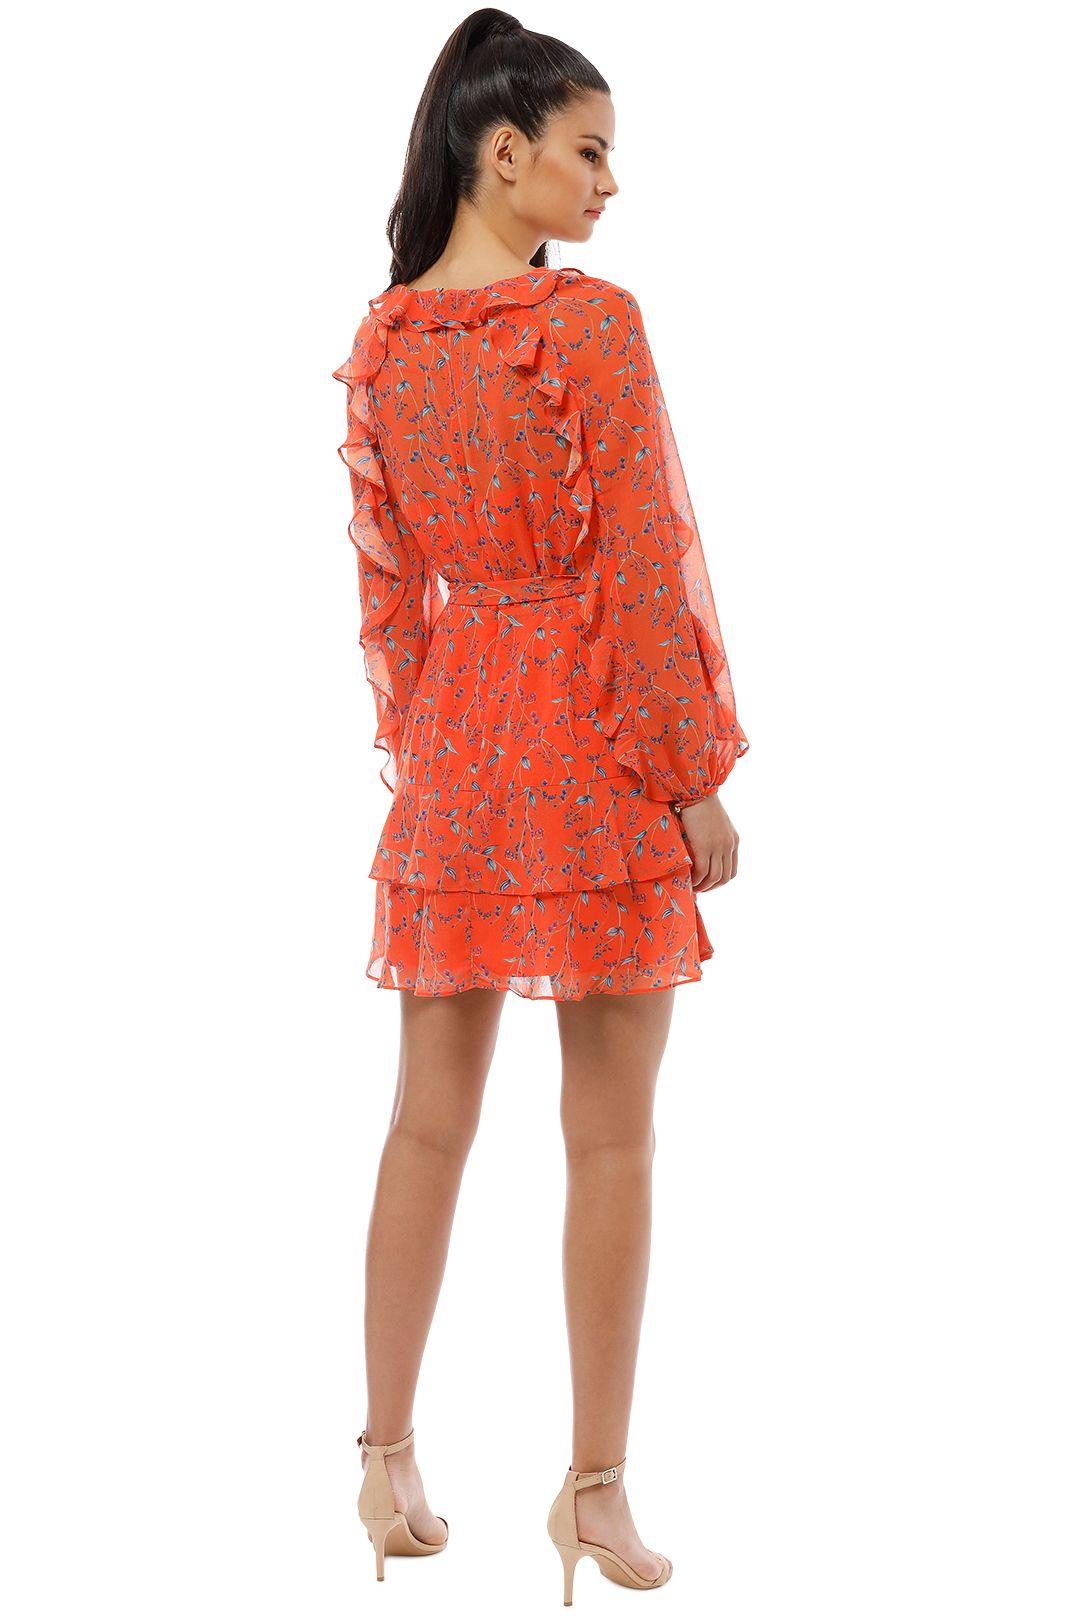 Talulah - Daring Day LS Mini Dress - Orange - Back